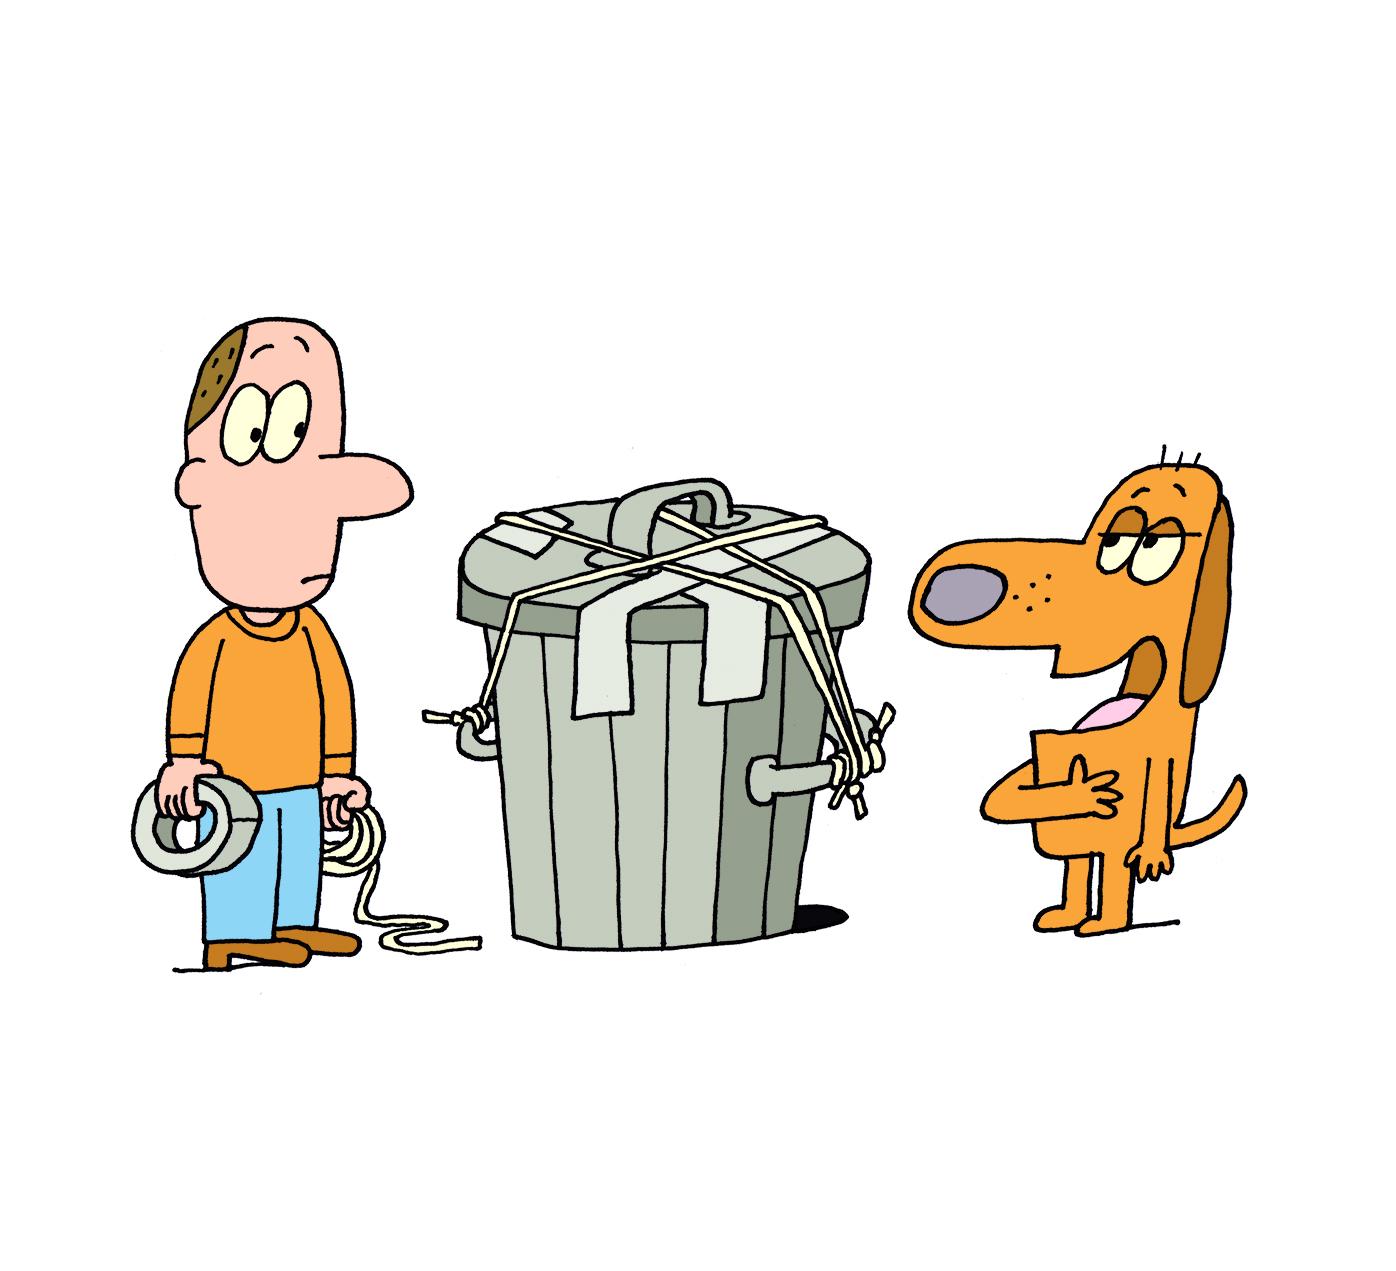 tied_trash_can_dog_cz_zoo.jpg